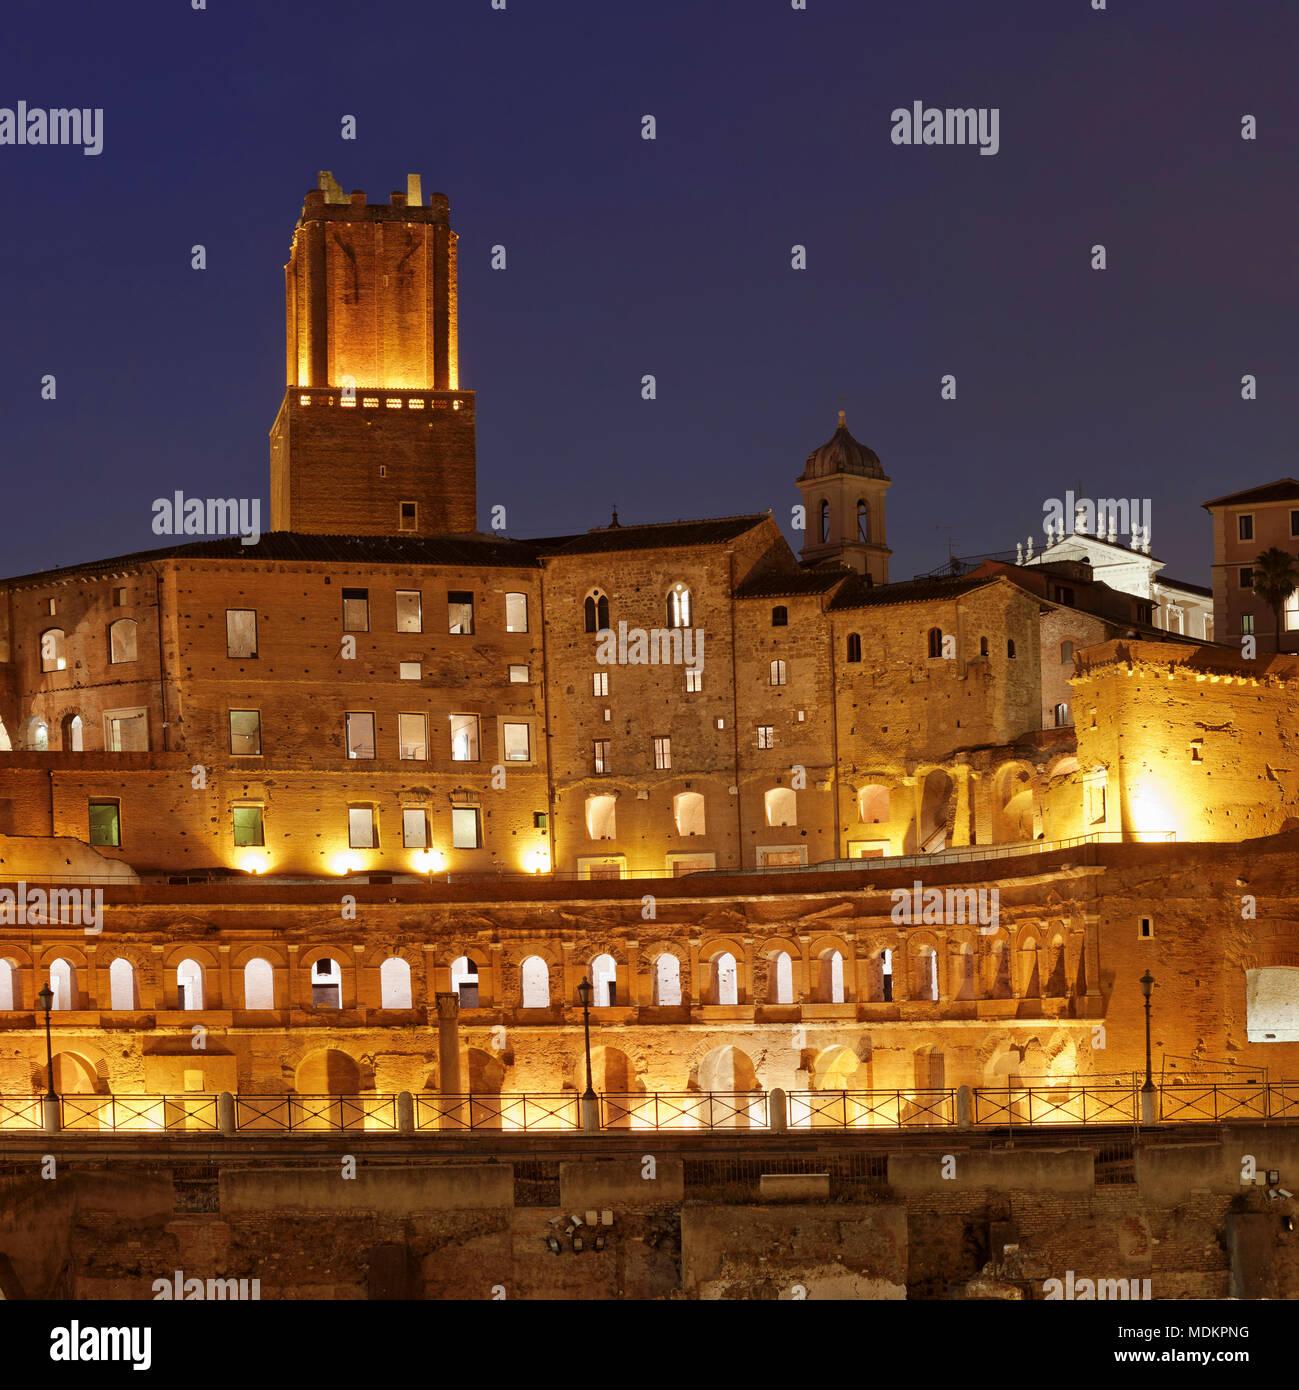 Trajan's Market, Torre delle Milizie Tower, Trajan's Forum, Foro di Trajano, at night, Rome, Lazio, Italy - Stock Image